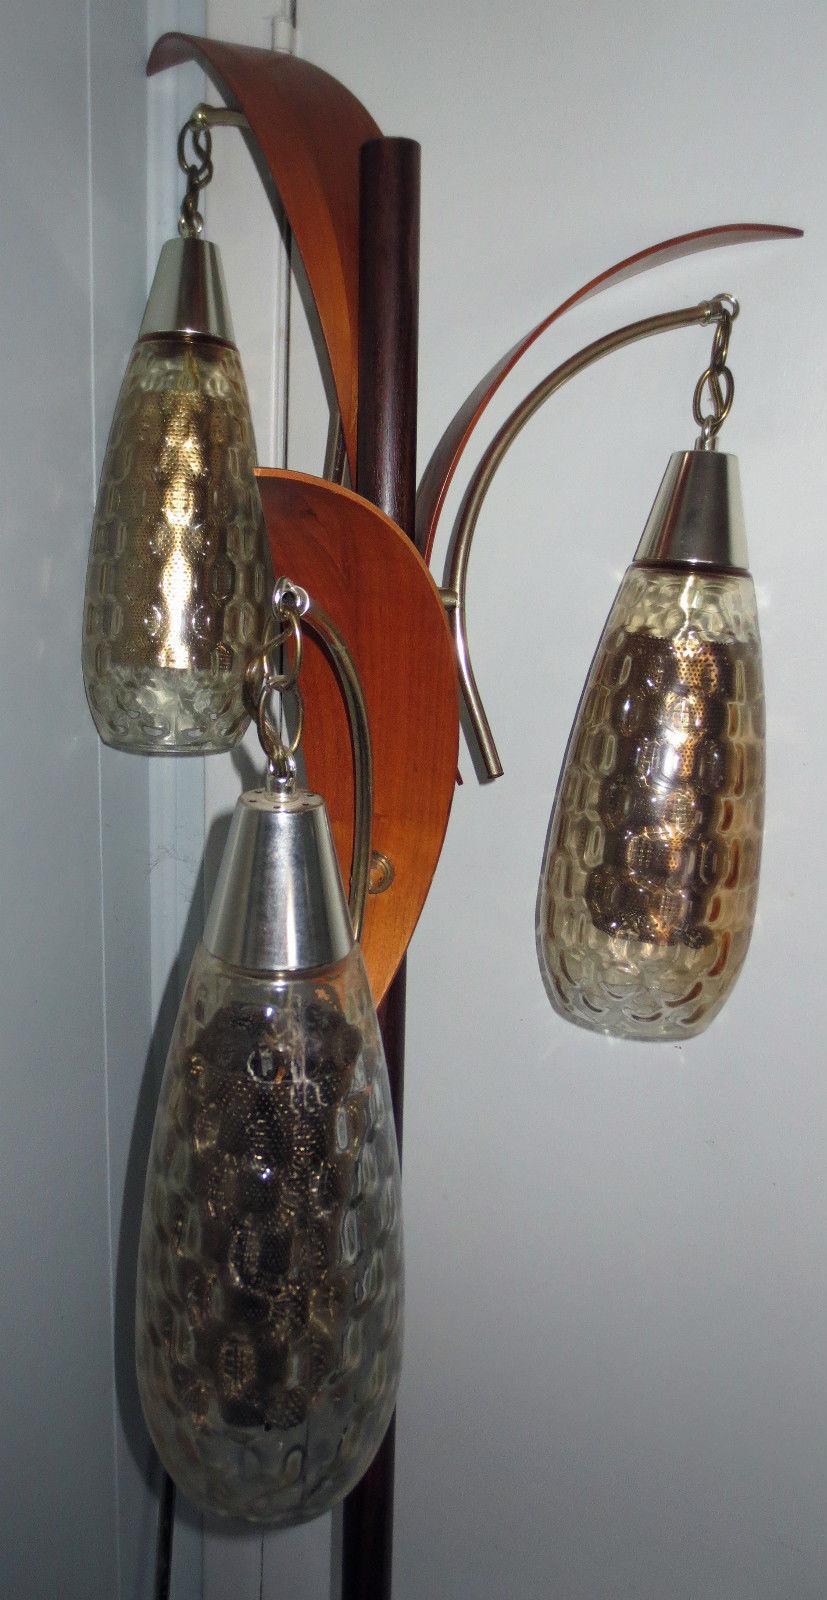 vintage tension pole lamp photo - 6